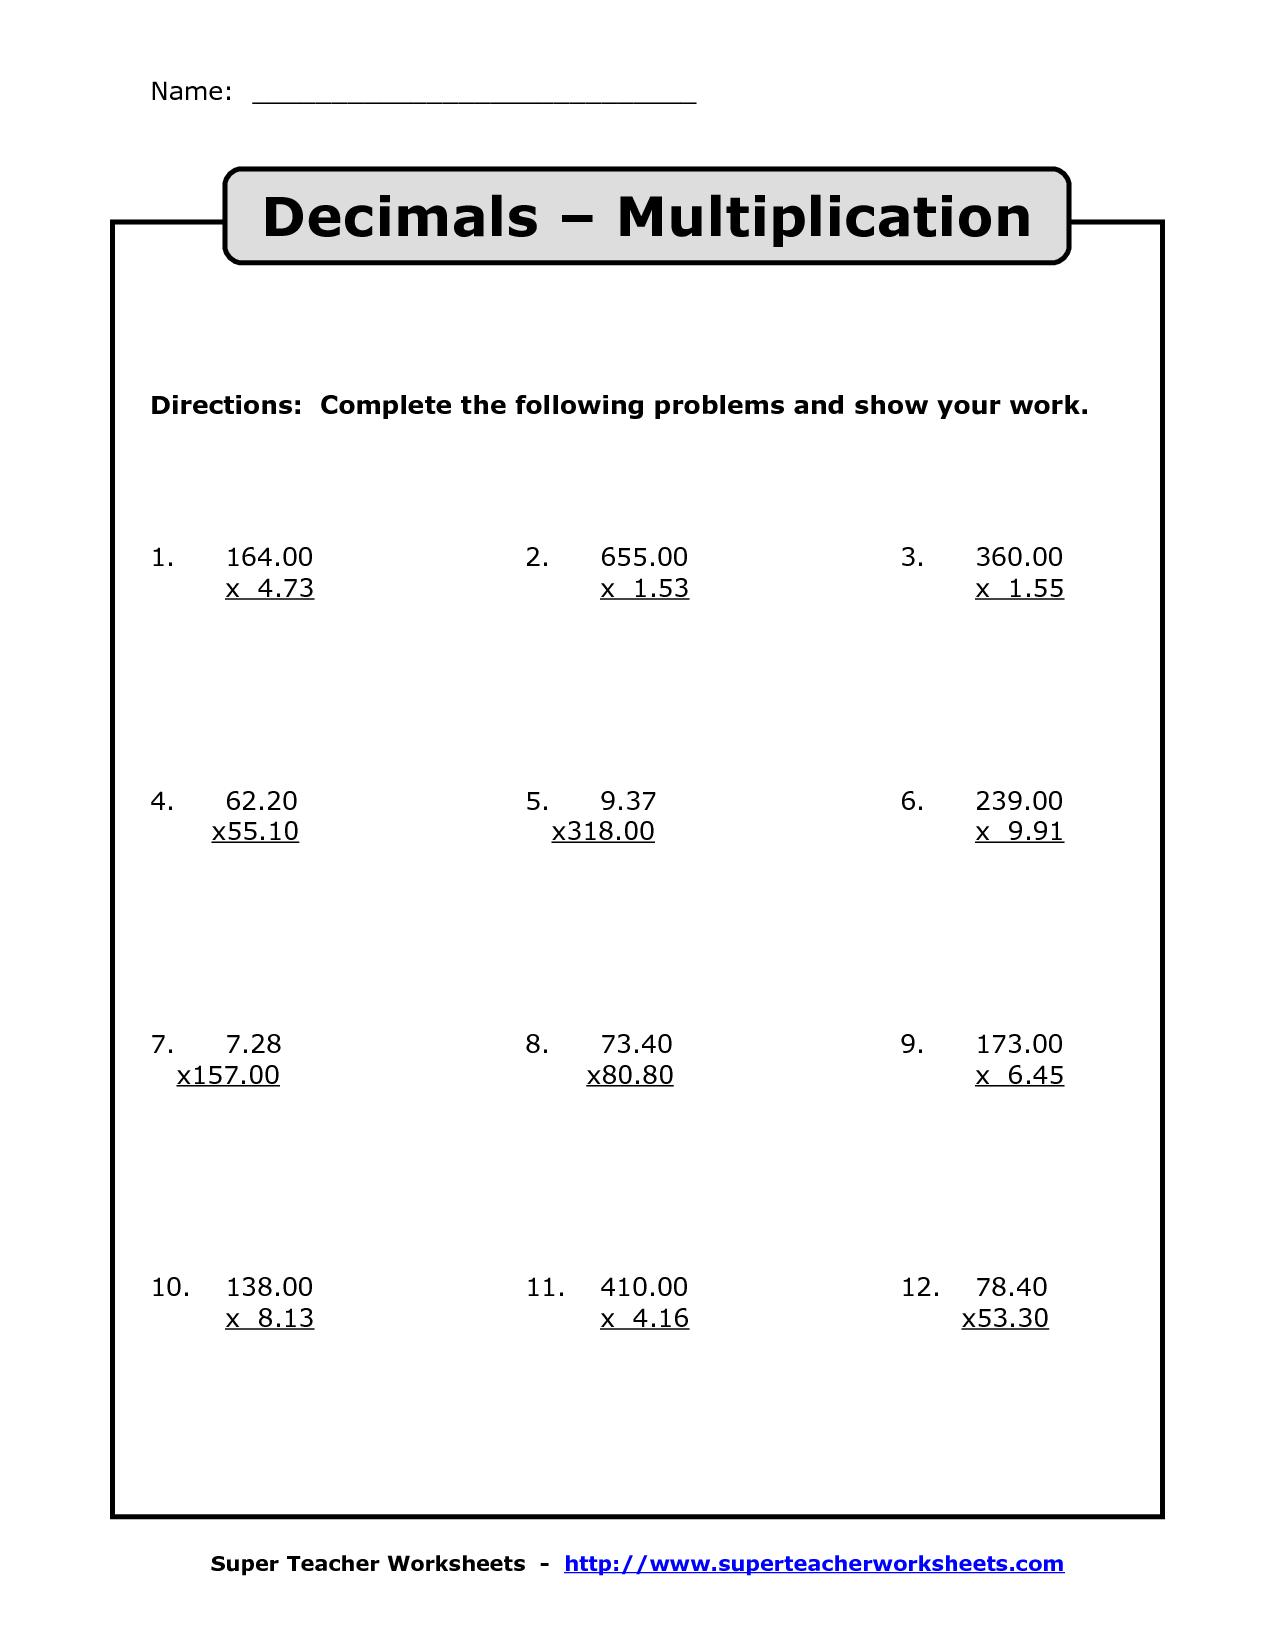 Multiplying Decimals | Multiplication With Decimals Worksheets | Free Printable Decimal Multiplication Worksheets